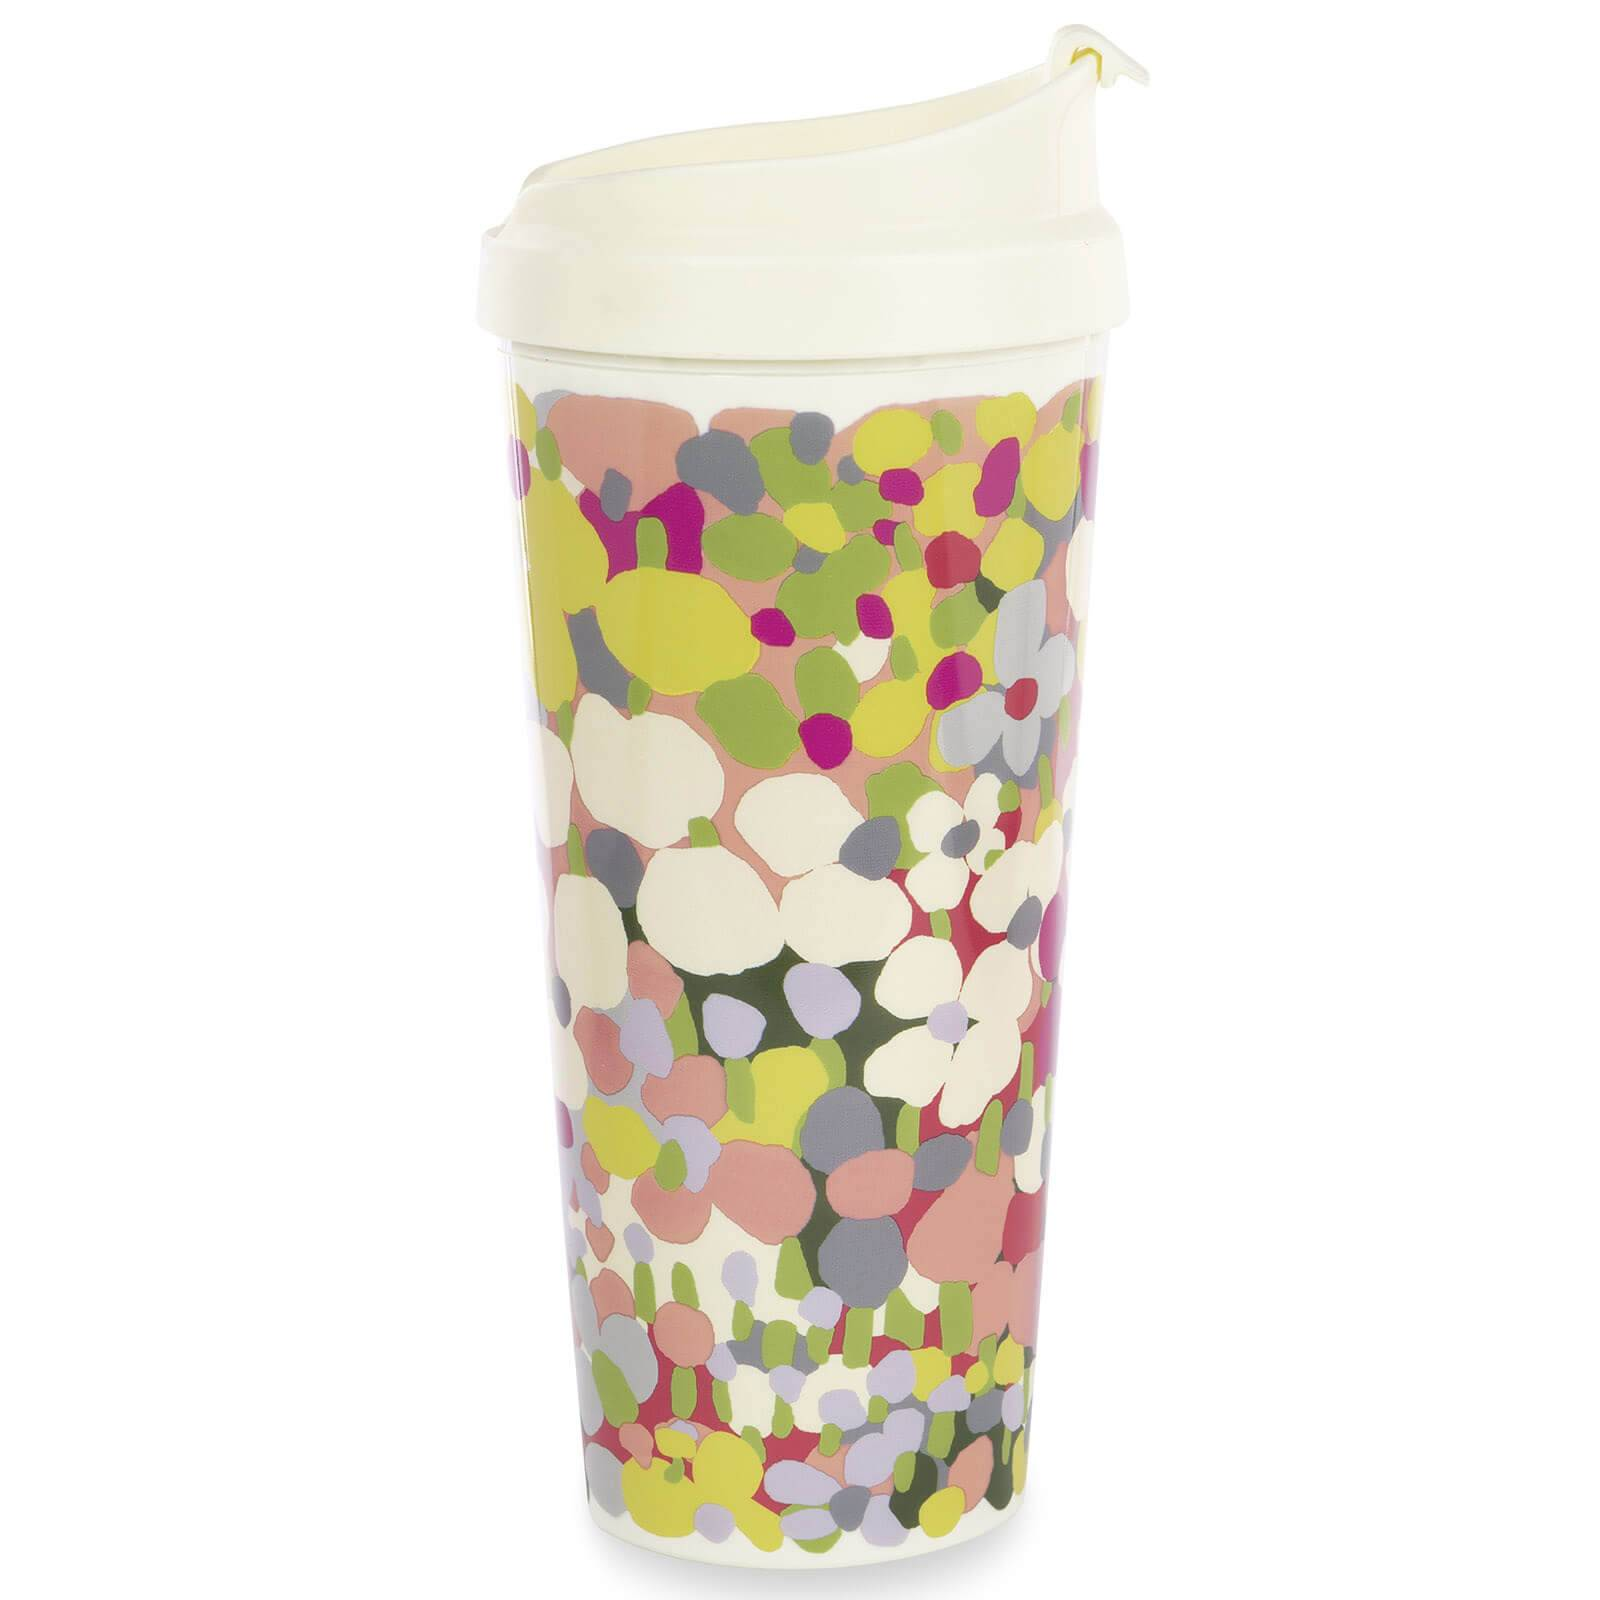 Kate Spade New York Kate Spade Thermal Mug Floral Dot